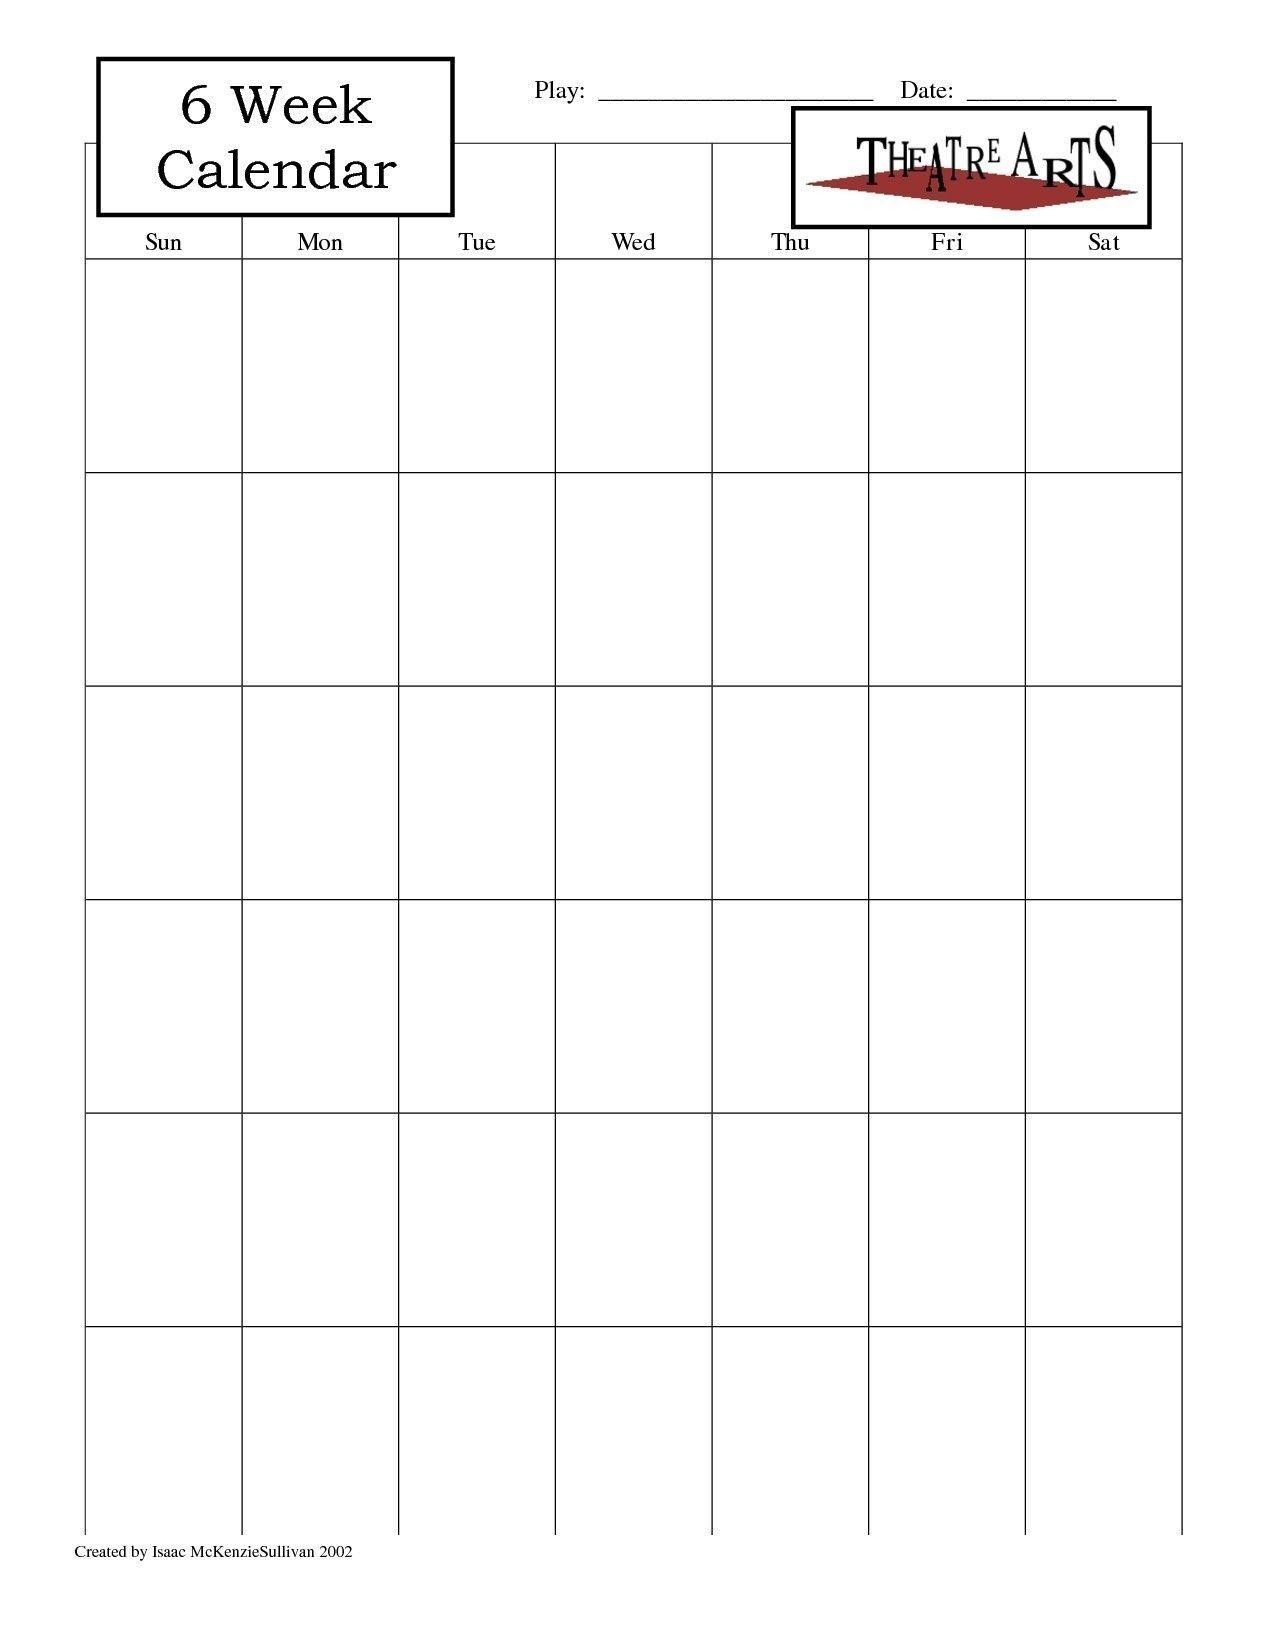 blank 6 week calendar | thekpark hadong dowload | daily